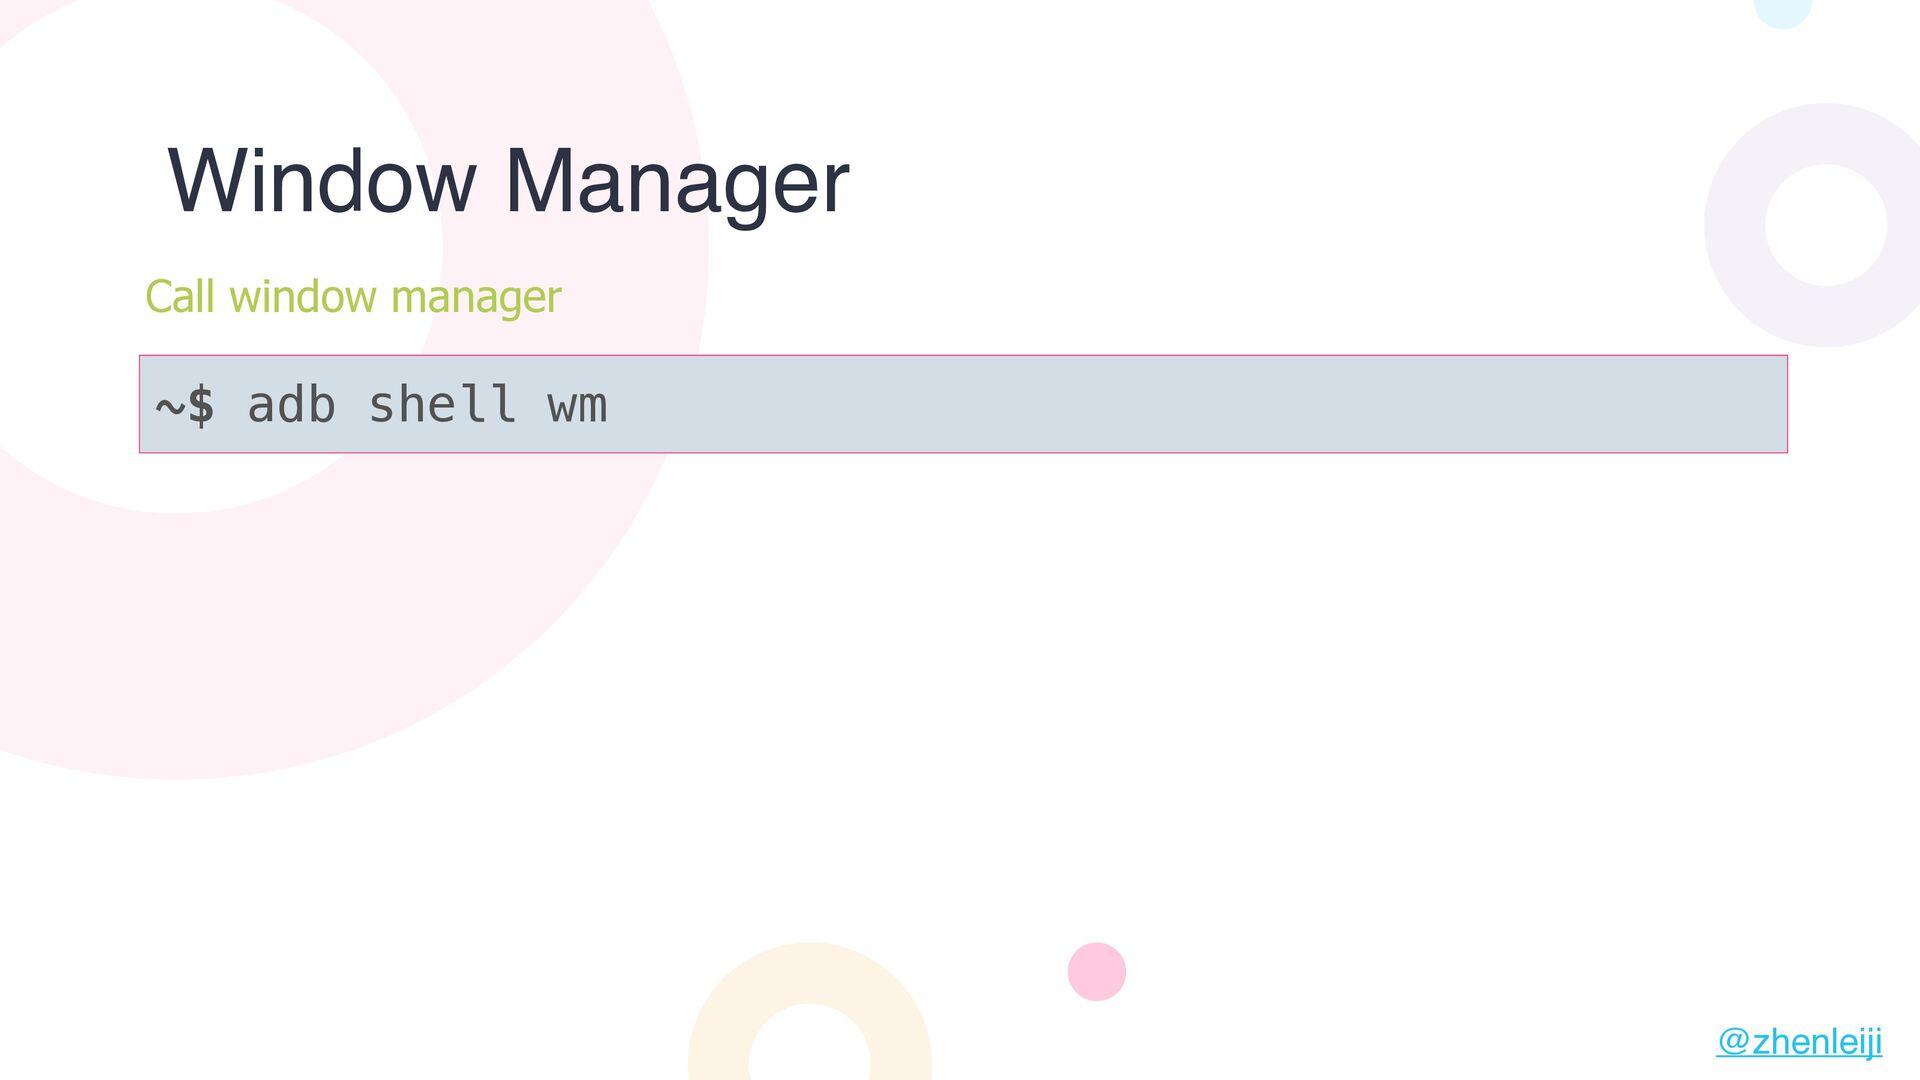 ~$ adb shell wm Window Manager Call window mana...